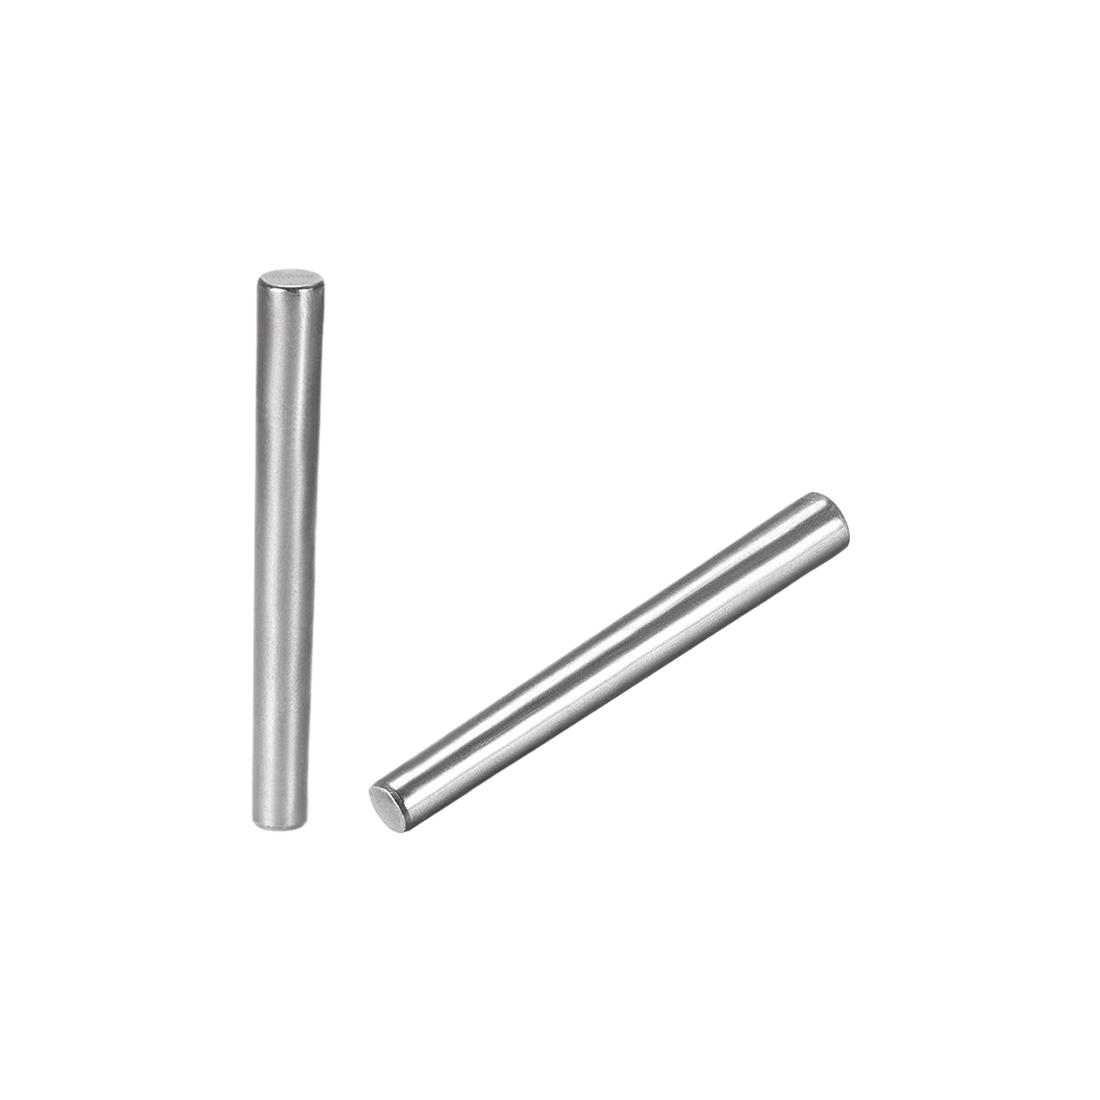 Carbon Steel GB117 50mm Length 5mm x 6mm Small End Diameter 1:50 Taper Pin 10Pcs